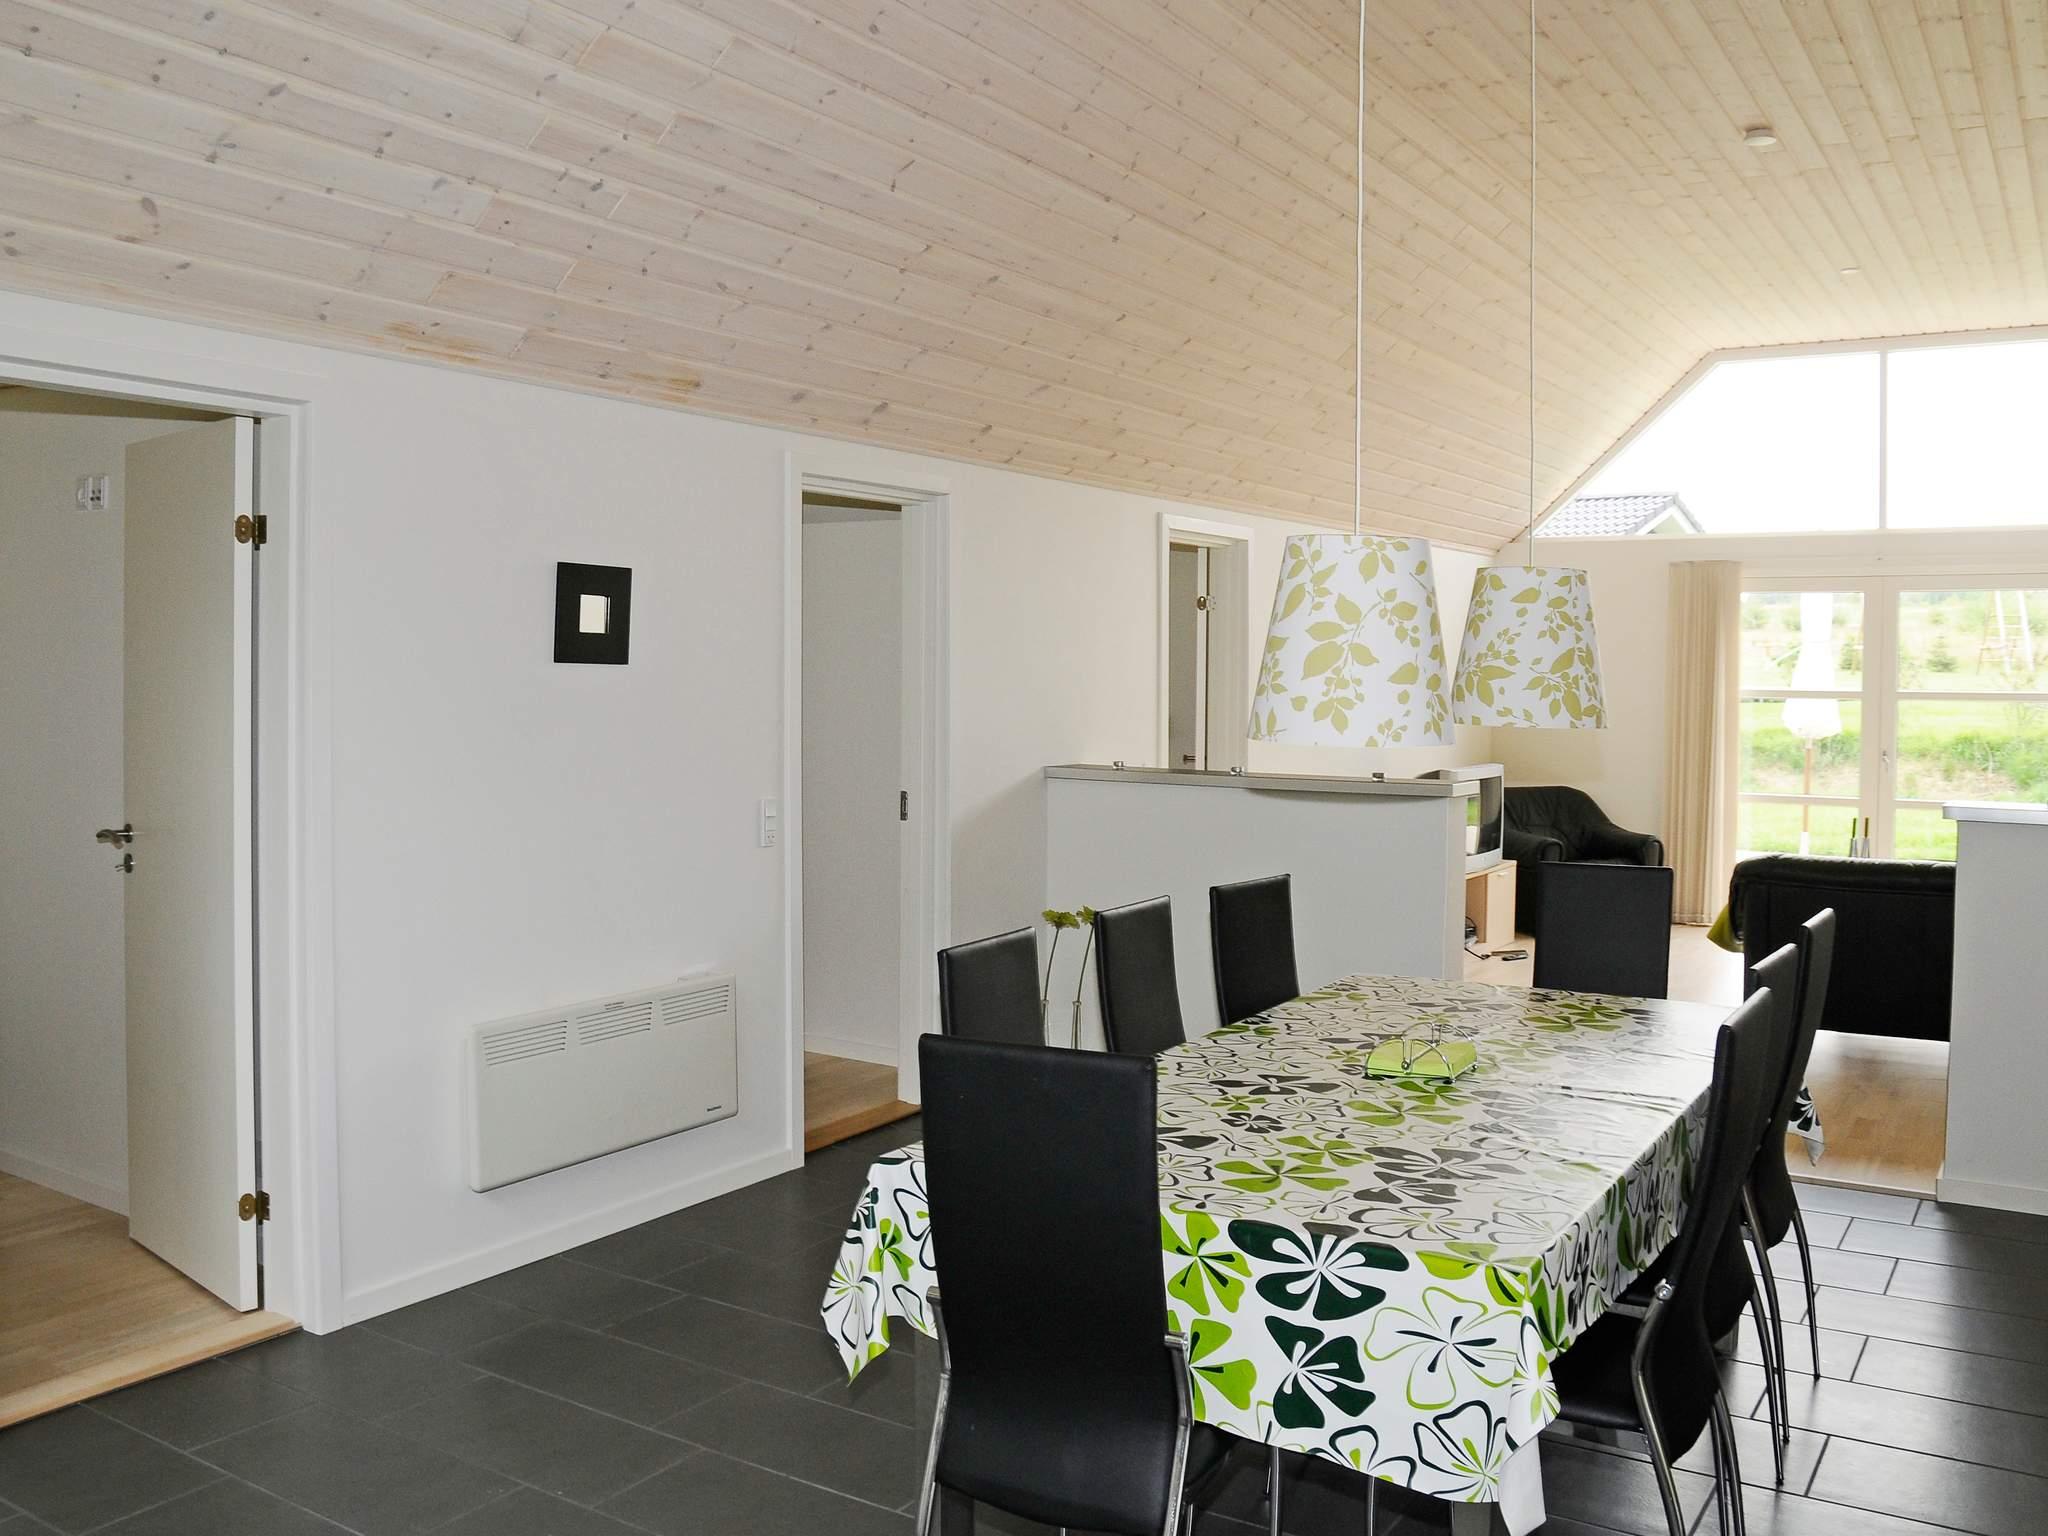 Ferienhaus Fjellerup Strand (336605), Fjellerup, , Ostjütland, Dänemark, Bild 1